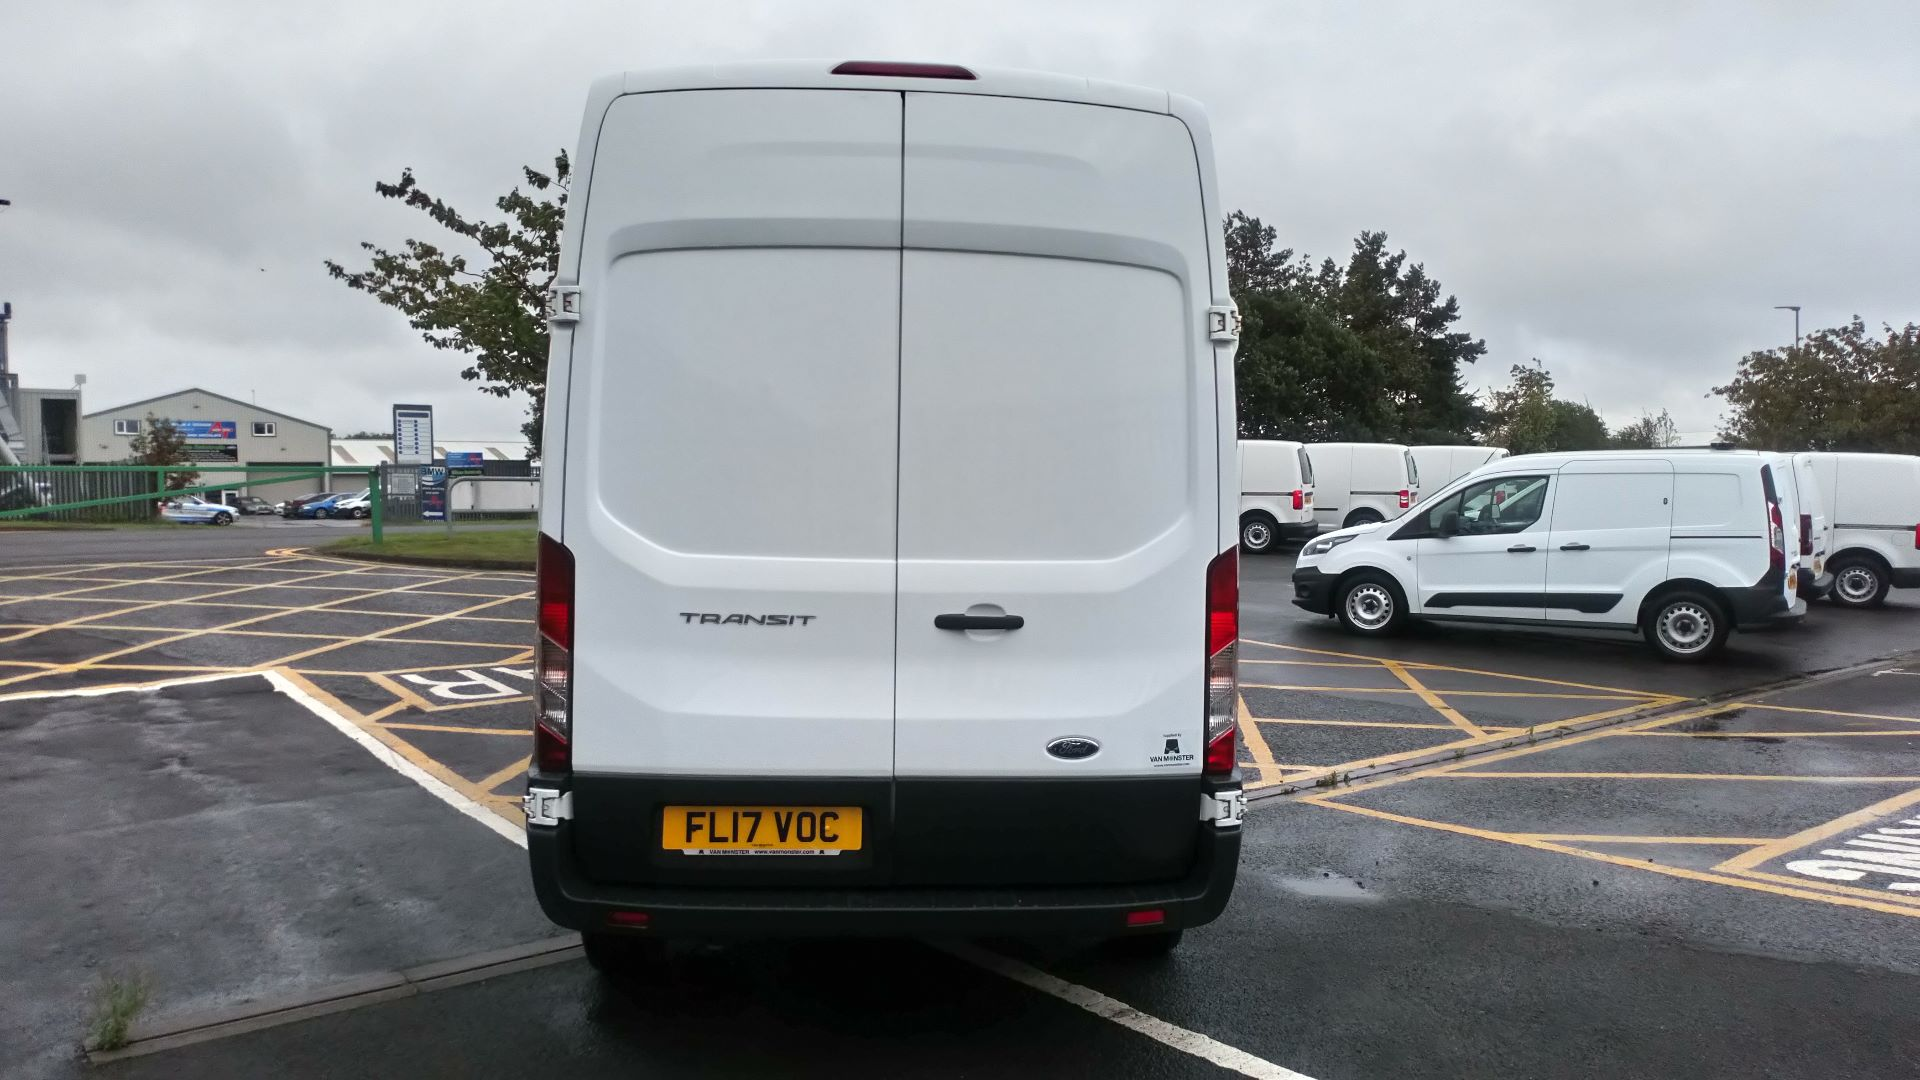 2017 Ford Transit 2.0 Tdci 130Ps H3 Van (FL17VOC) Image 5